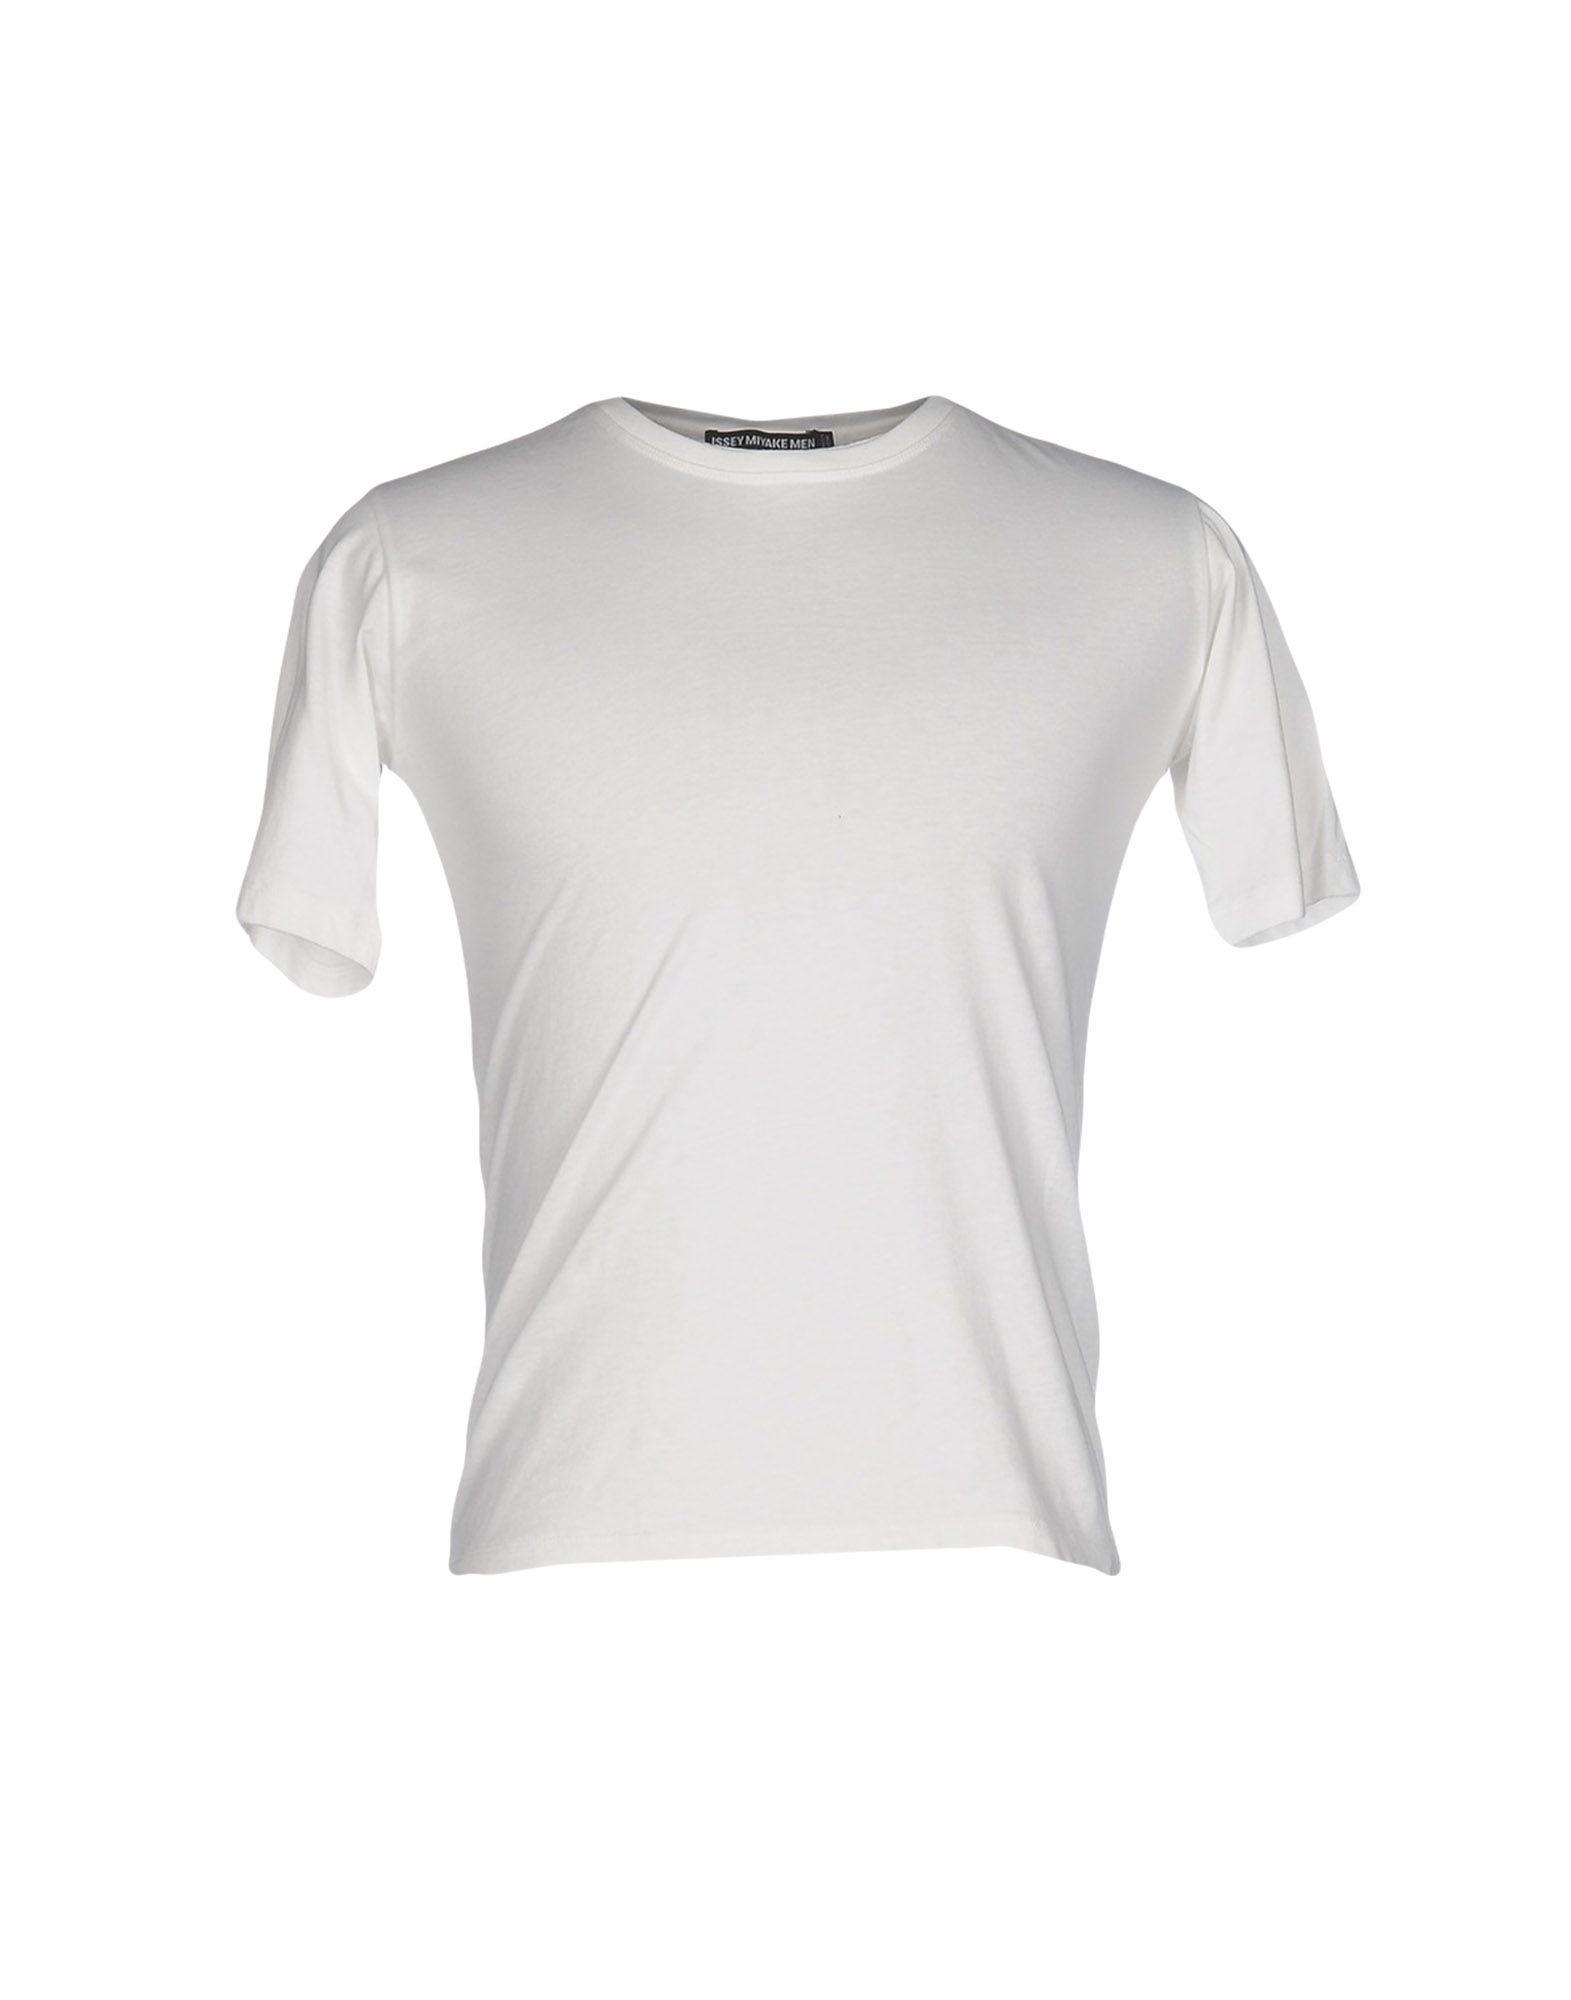 issey miyake t shirt in white for men lyst